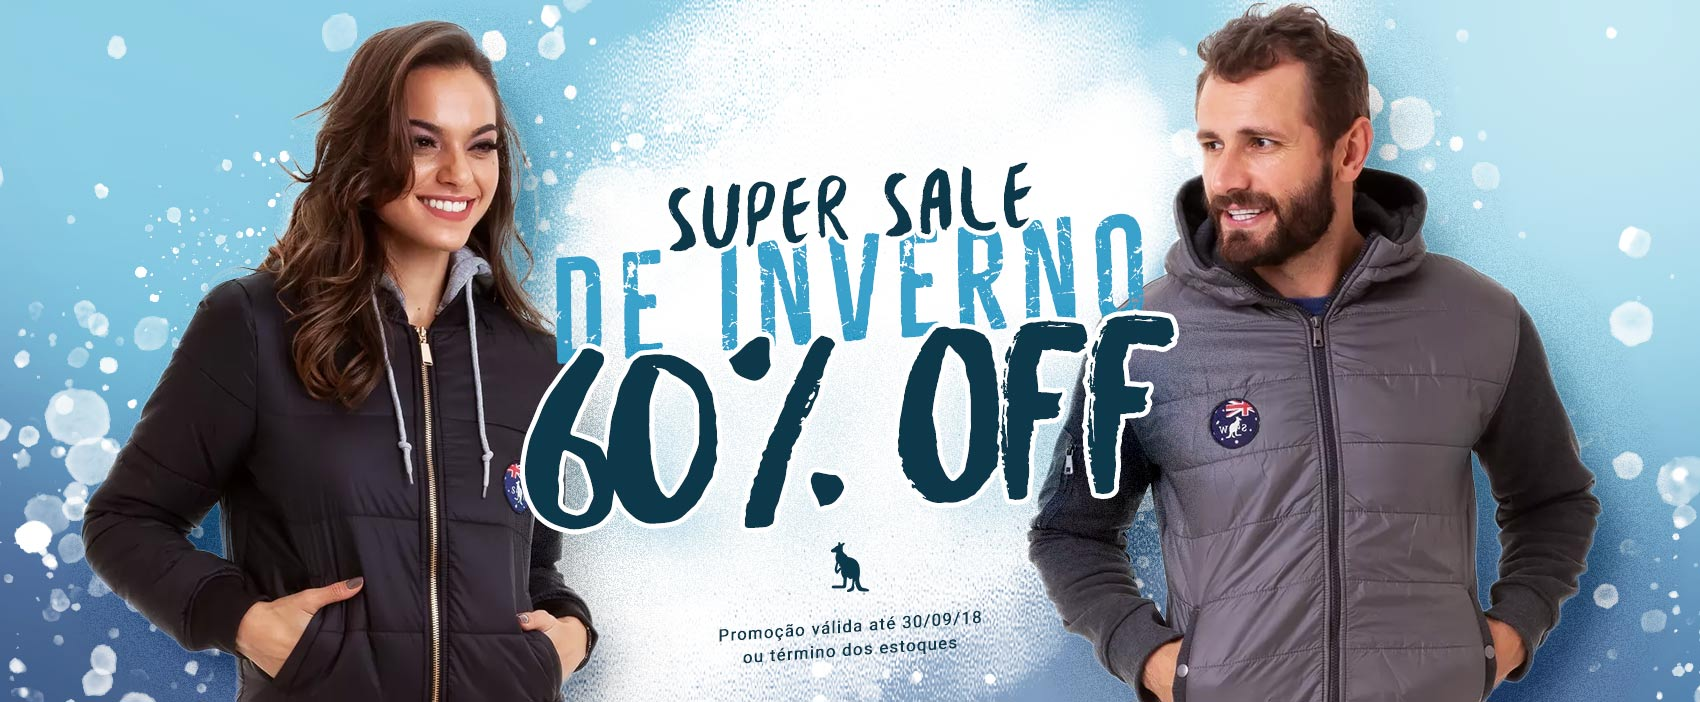 inverno 60% off